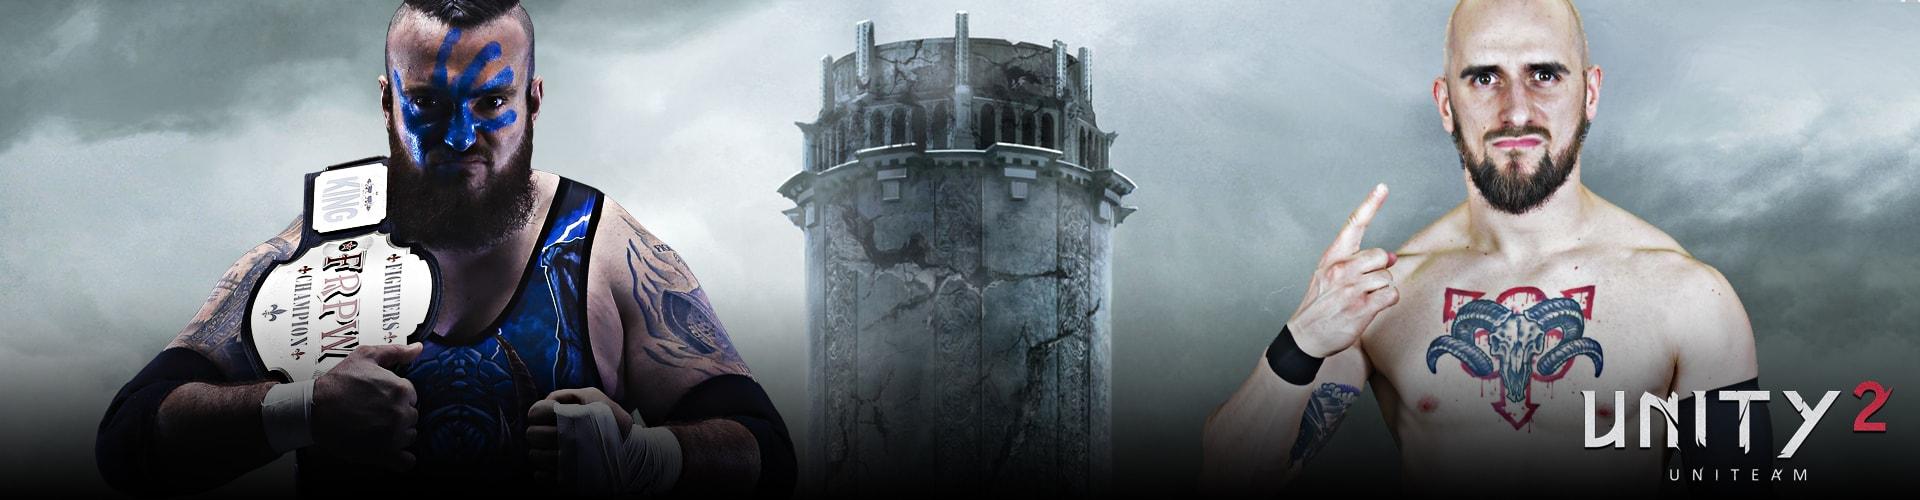 Ragnar Rok vs durançon